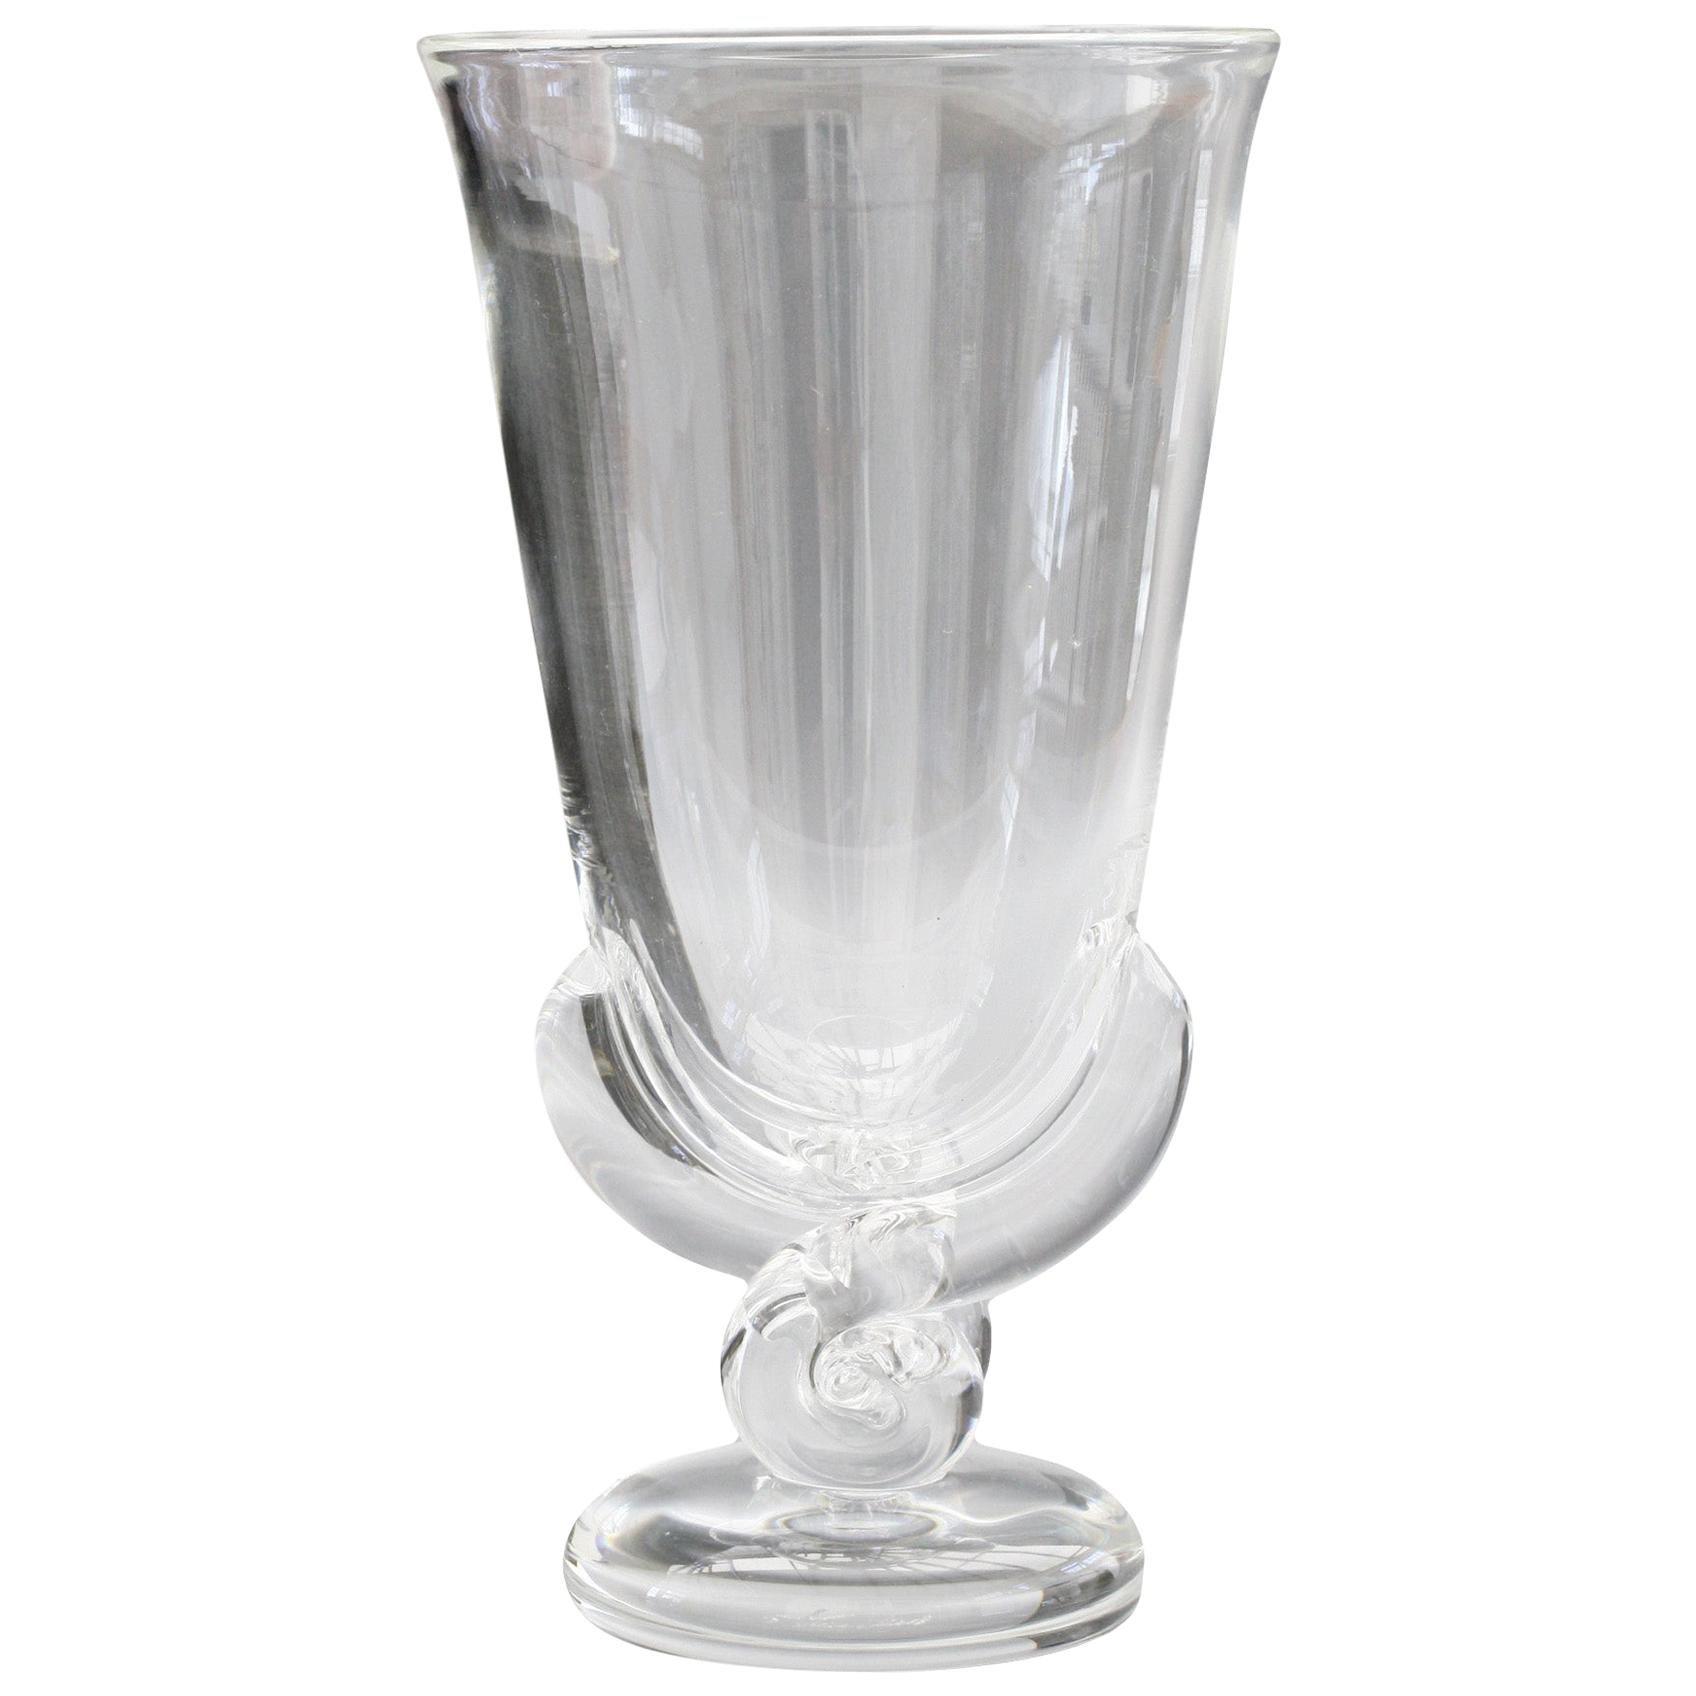 Steuben Art Deco Glass Flower Shaped Vase by George Thompson, circa 1942